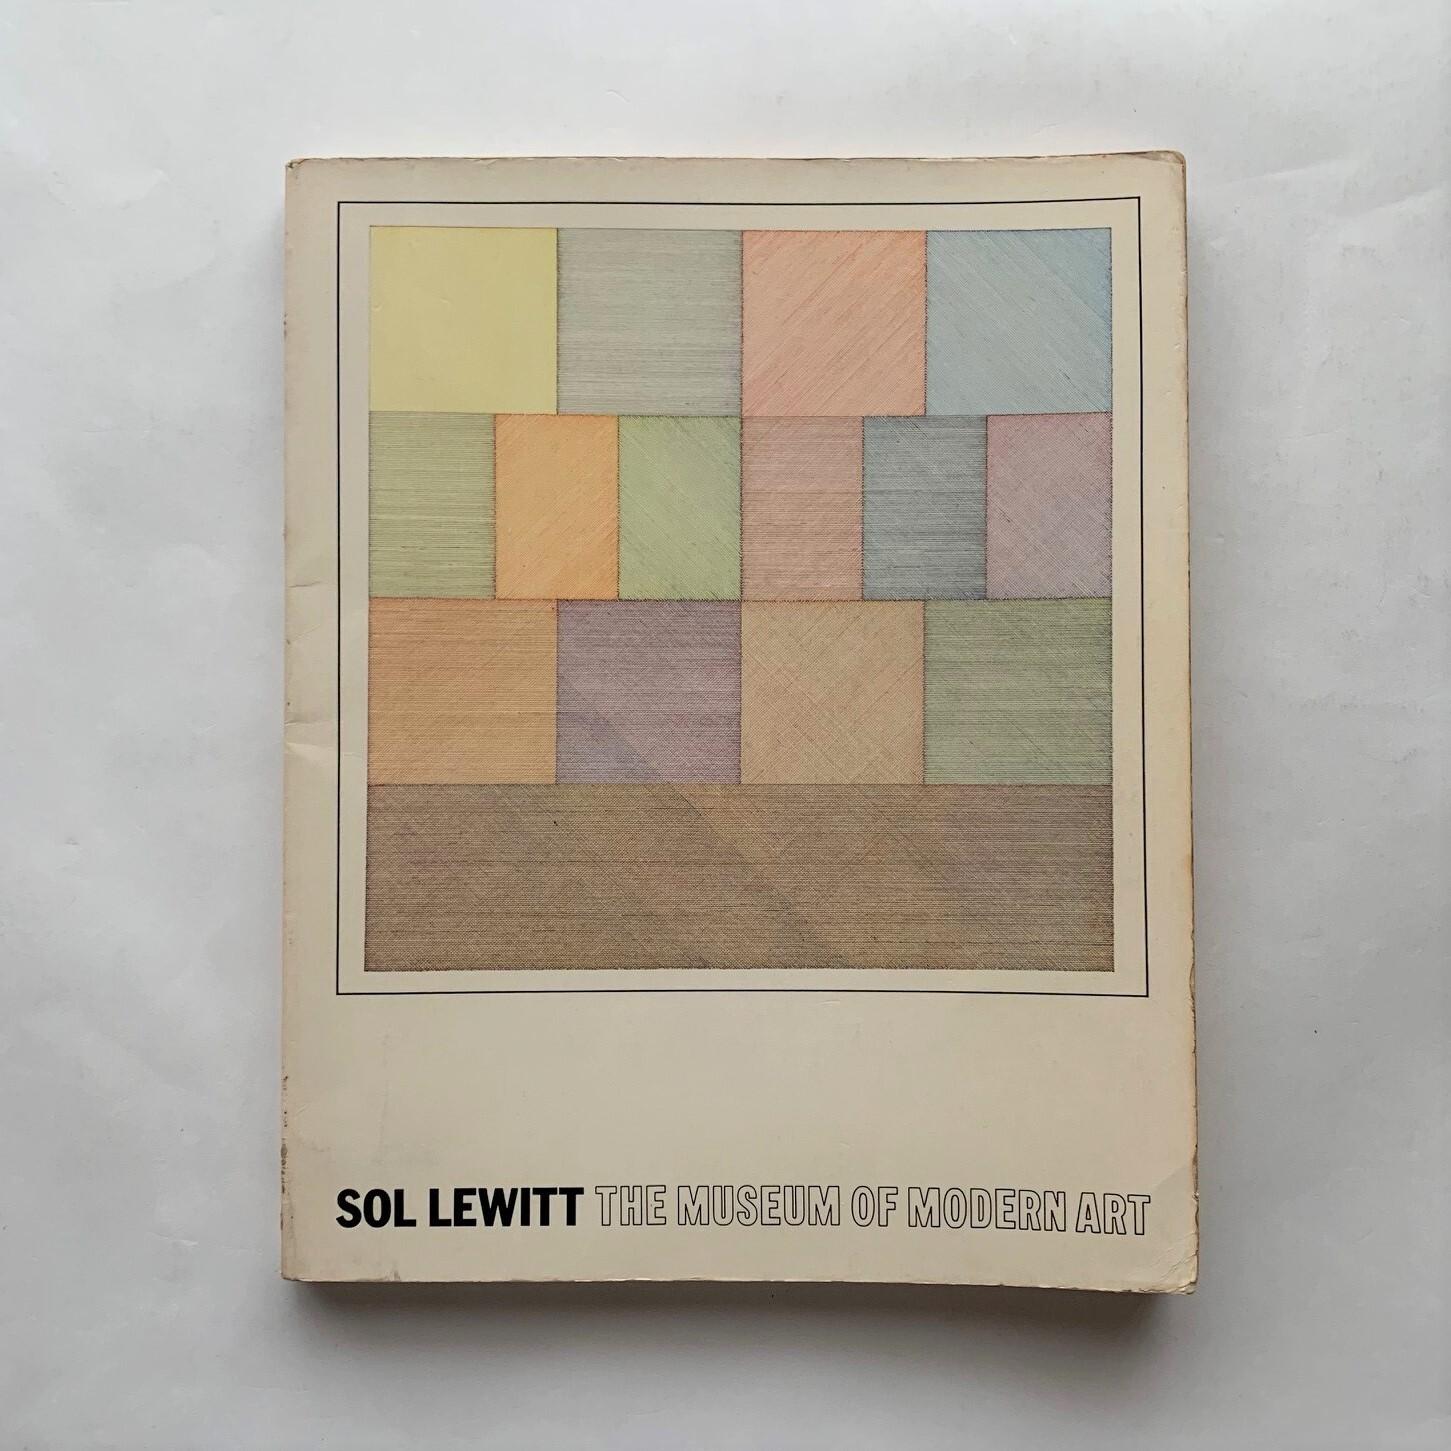 SOL LEWITT THE MUSEUM OF MODERN ART  /  ソル・ルウィット